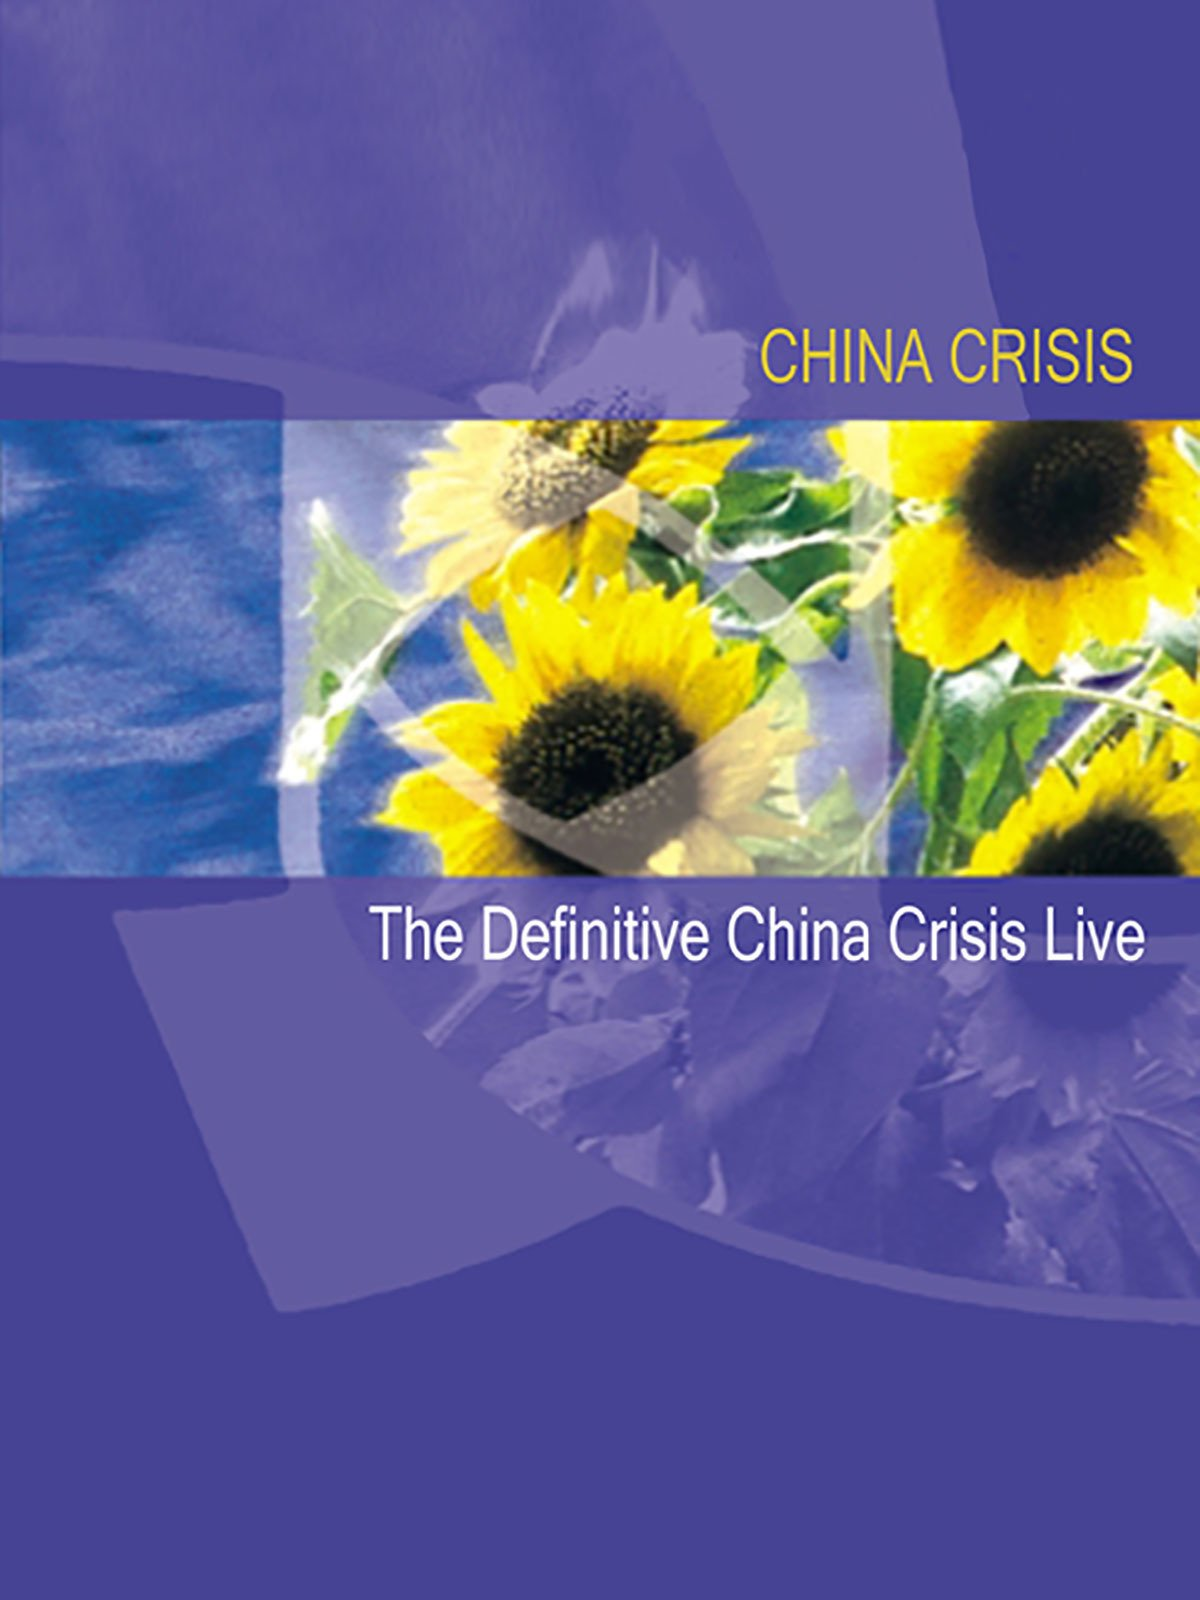 China Crisis - The Definitive China Crisis Live on Amazon Prime Video UK